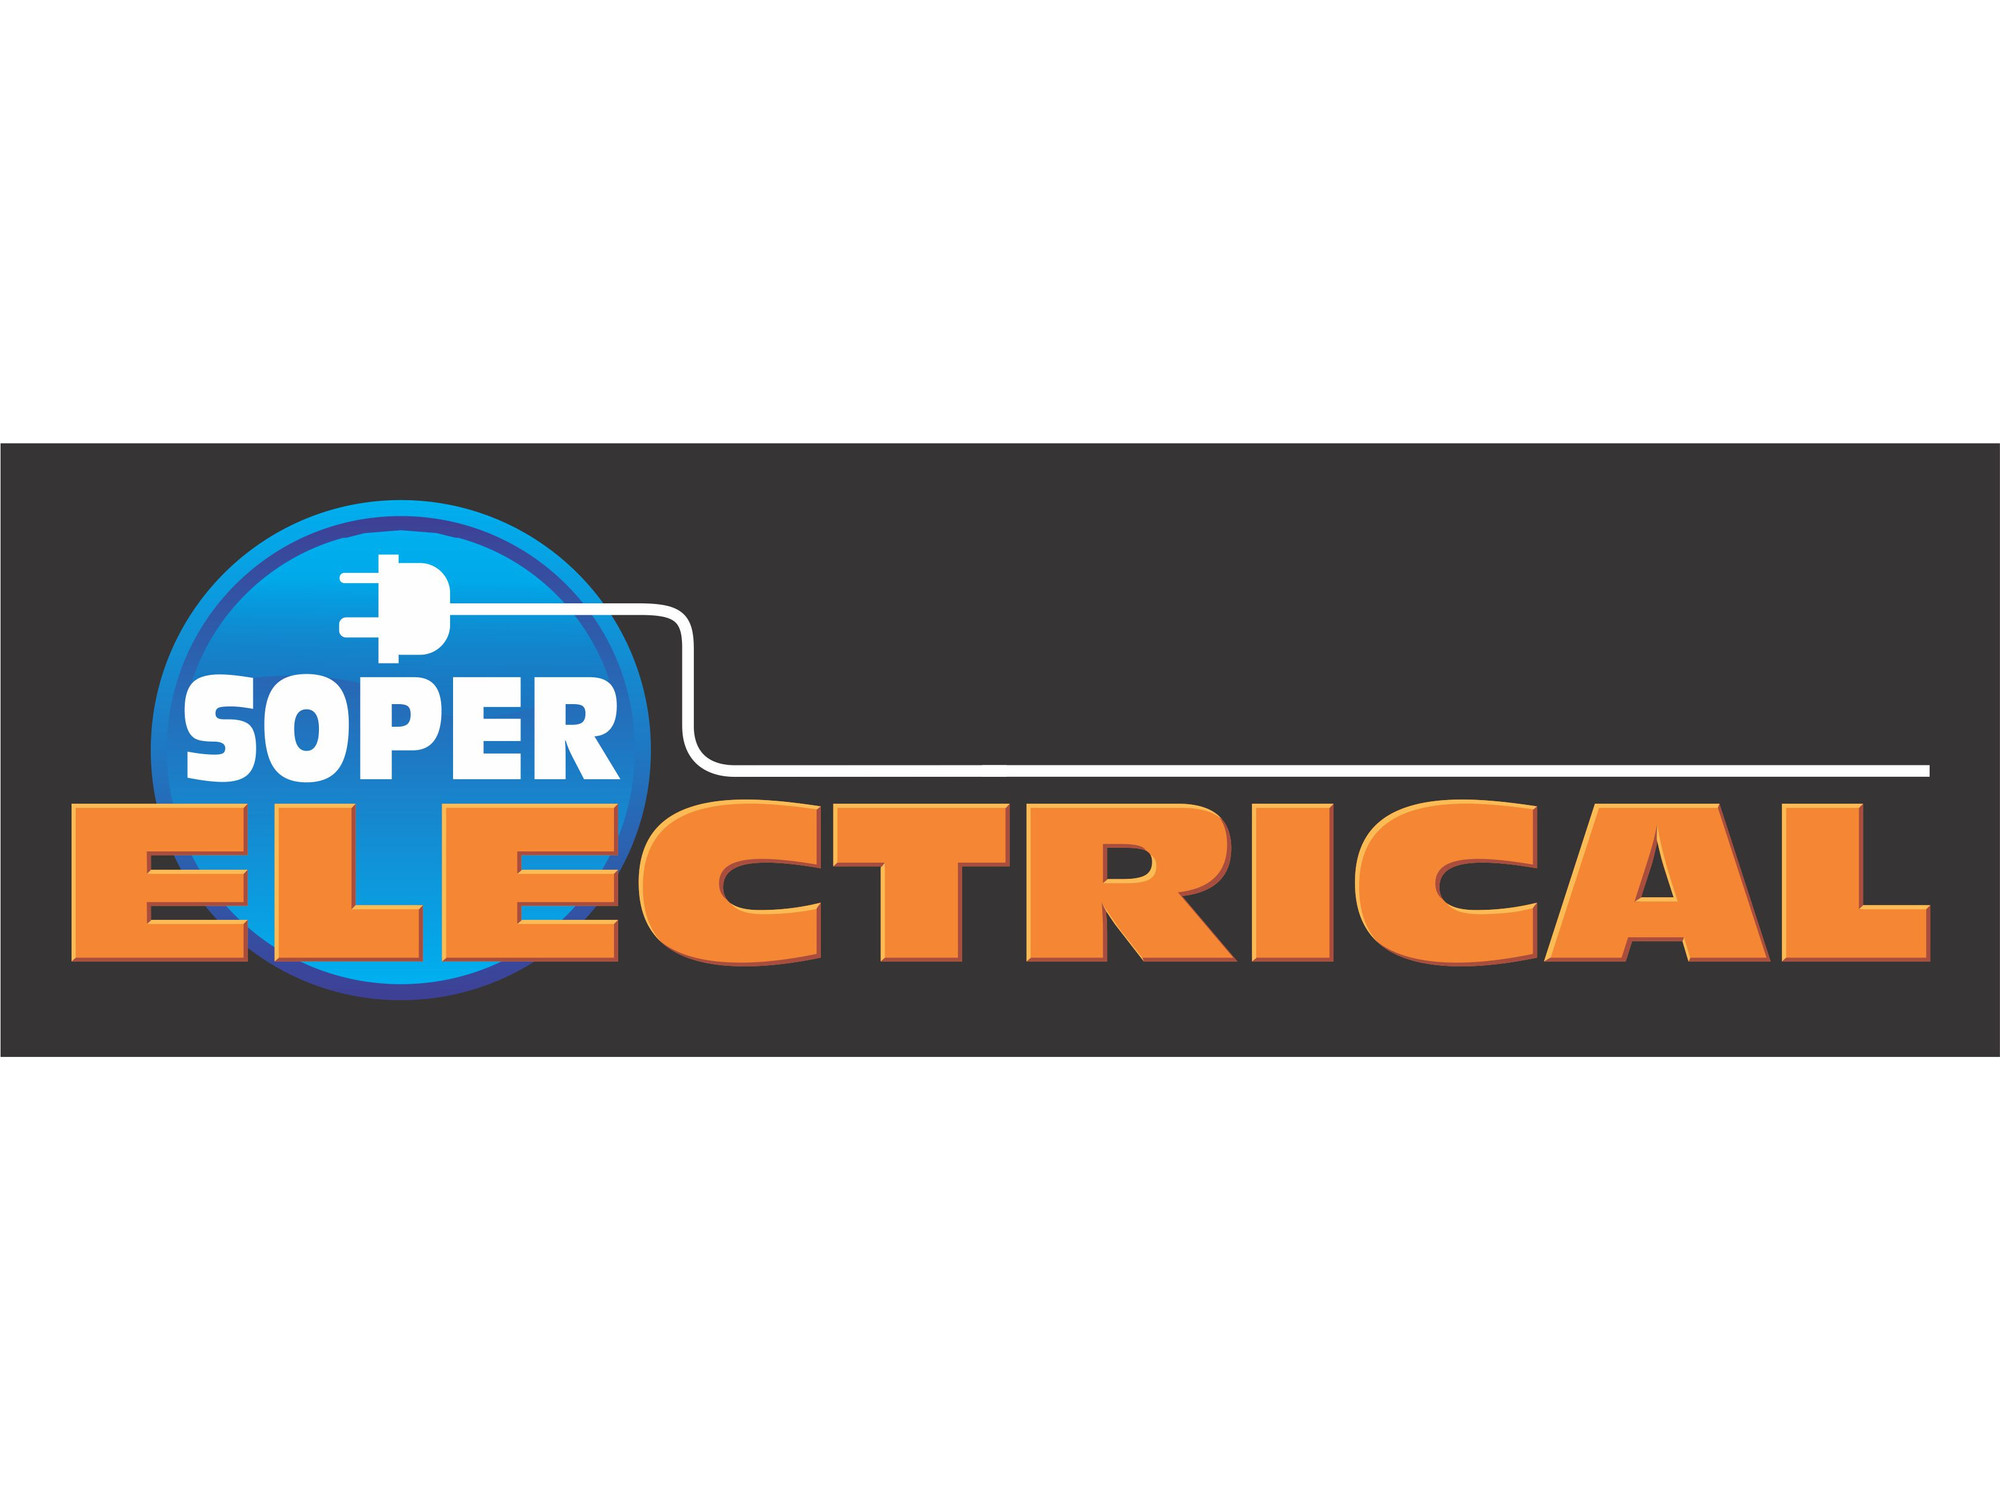 Soper Electrical logo